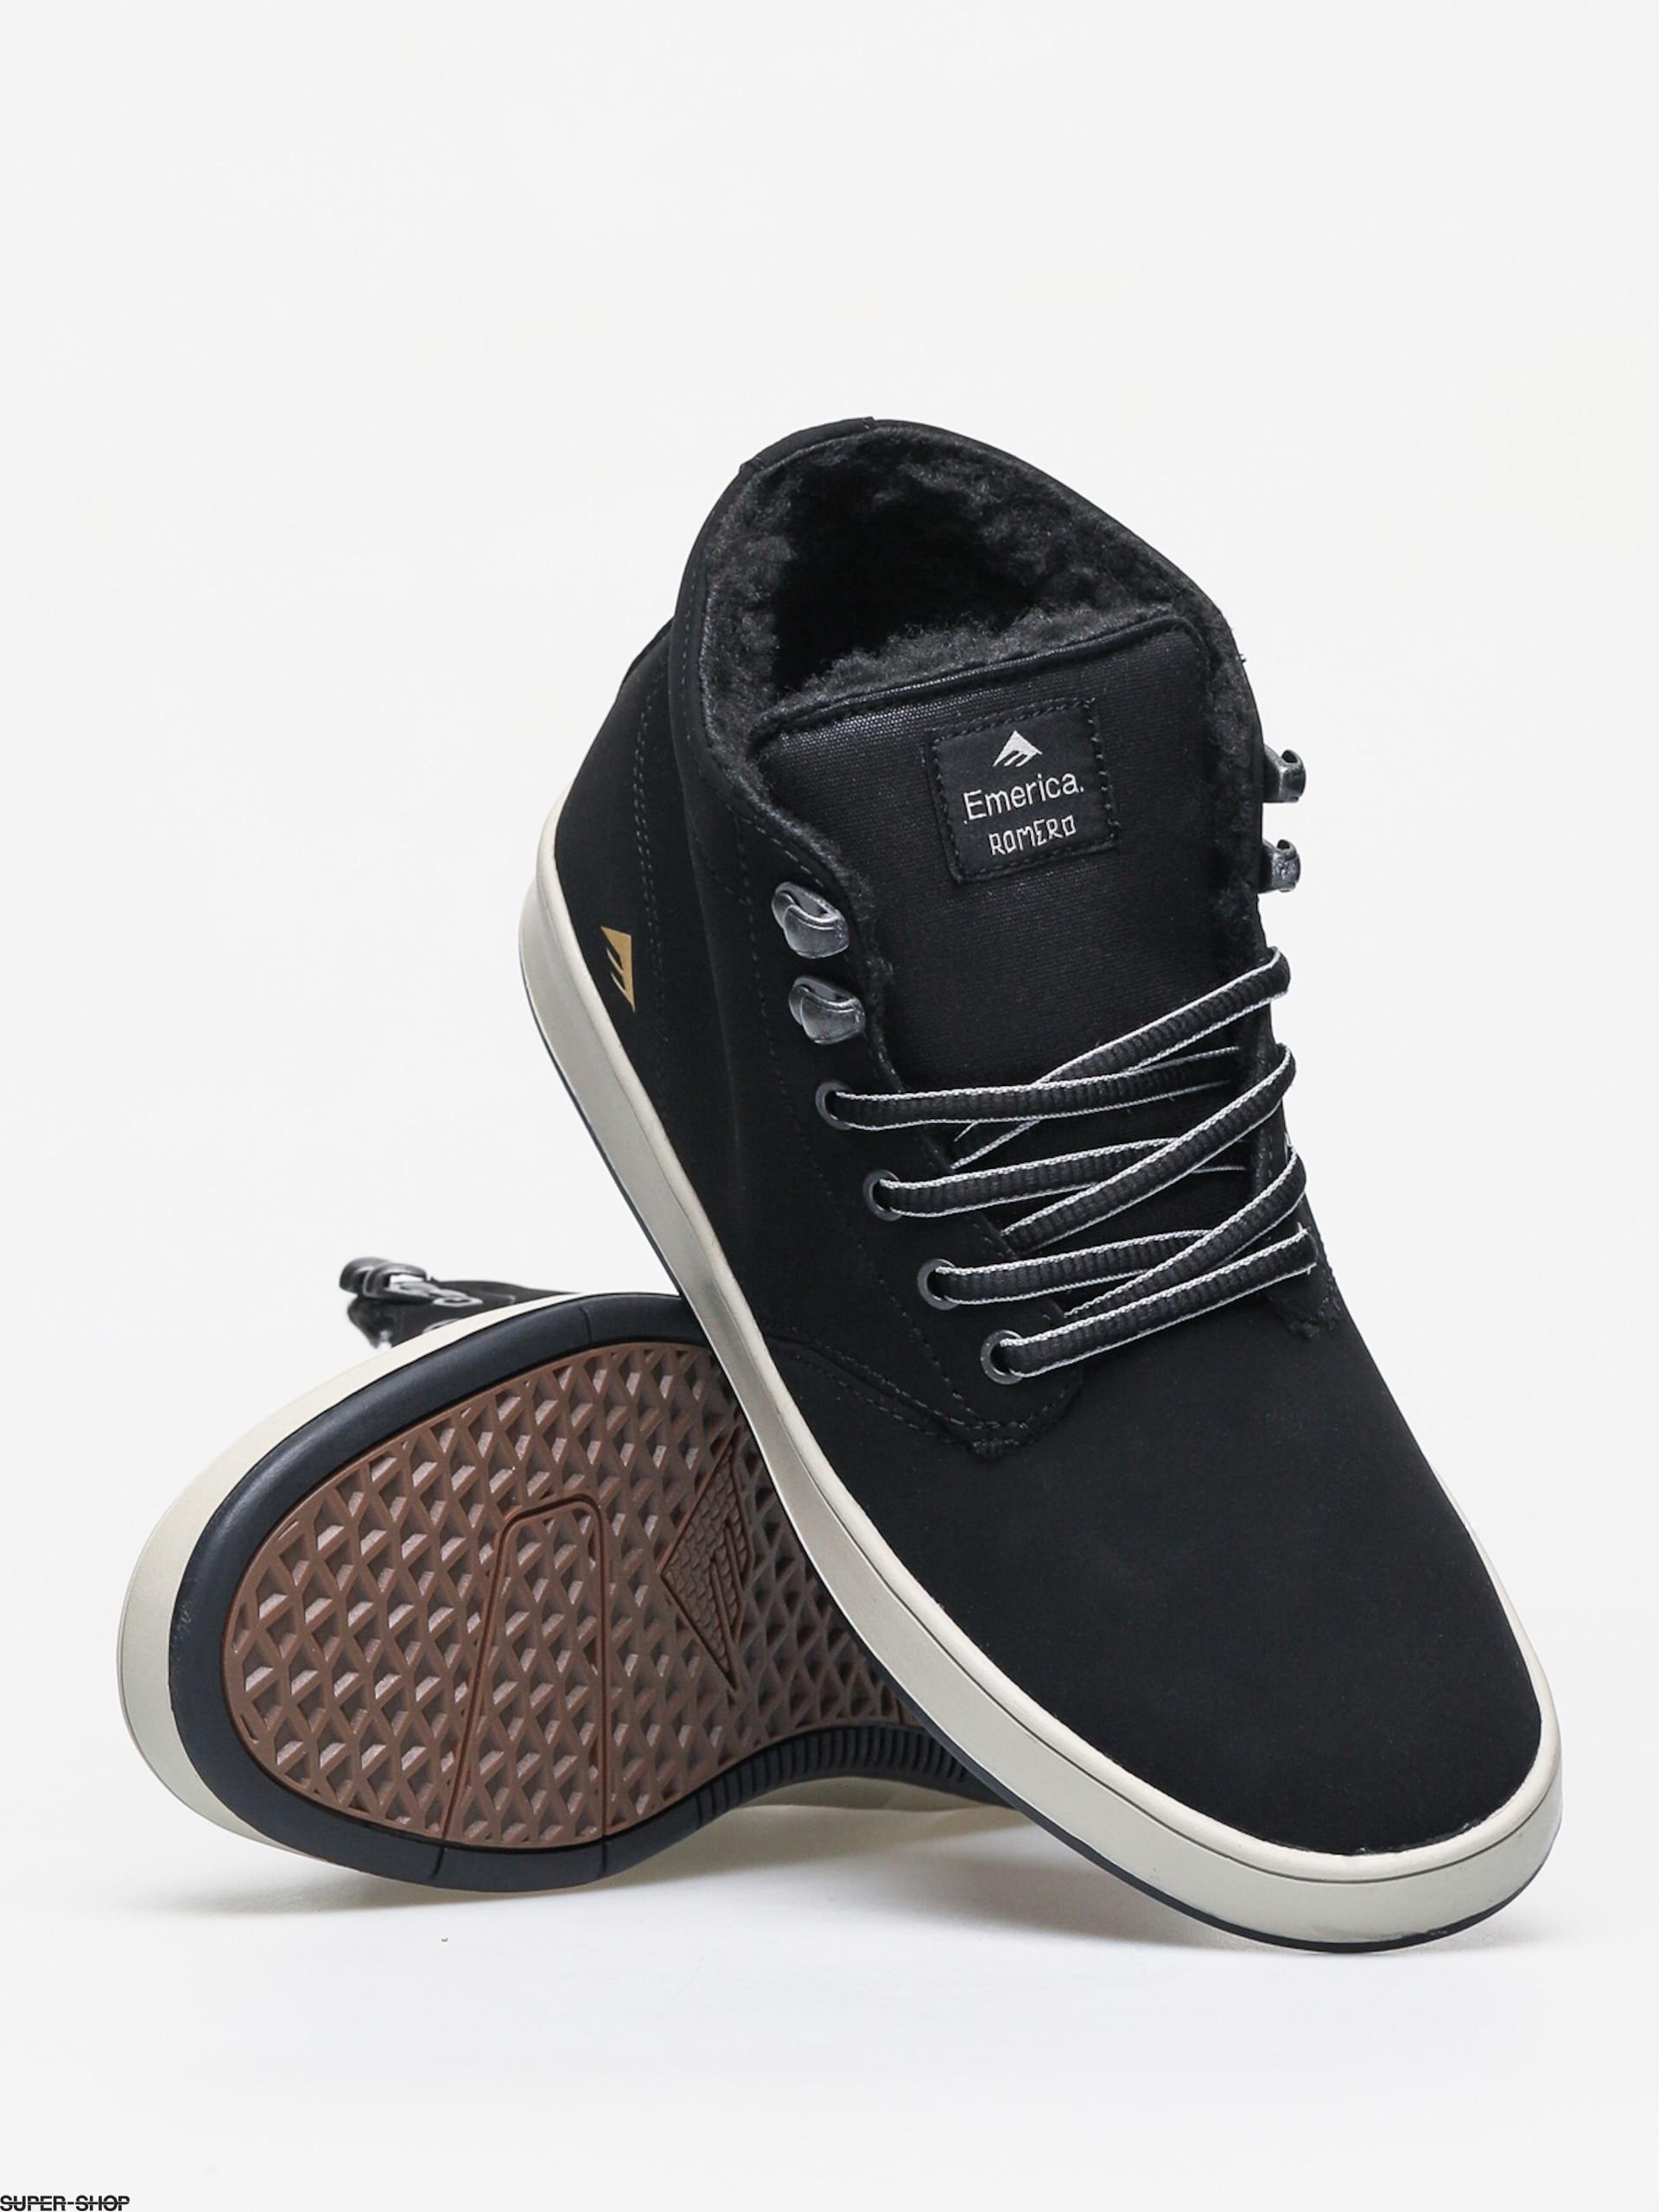 Emerica Romero Laced High Shoes (black)